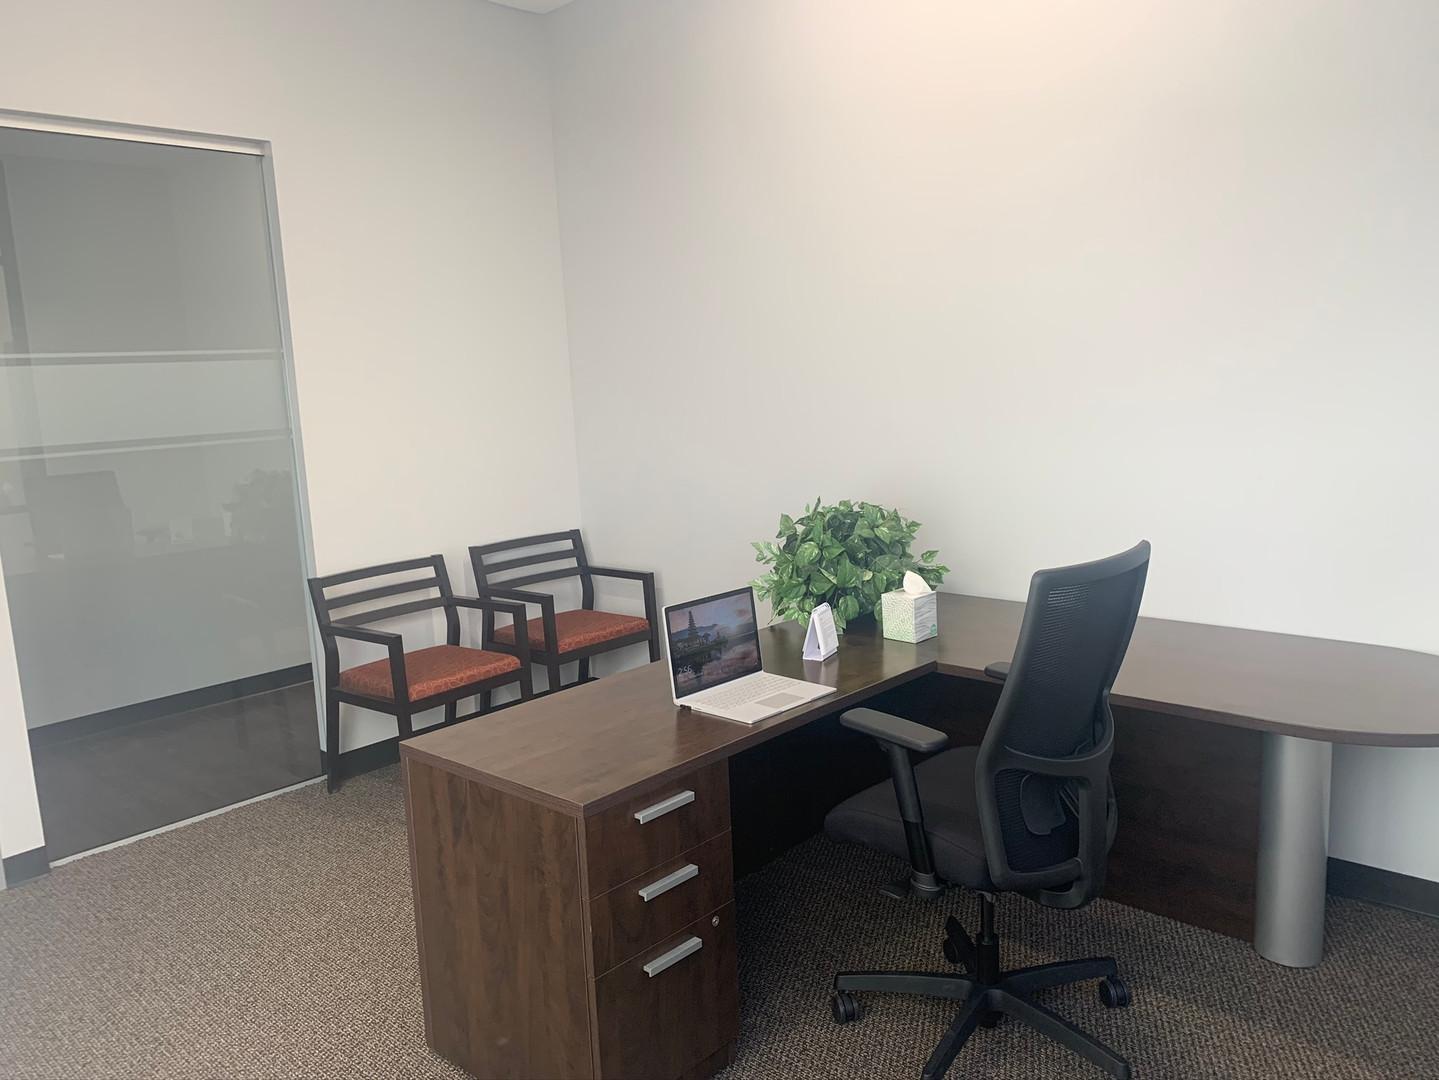 Hot Desks Available